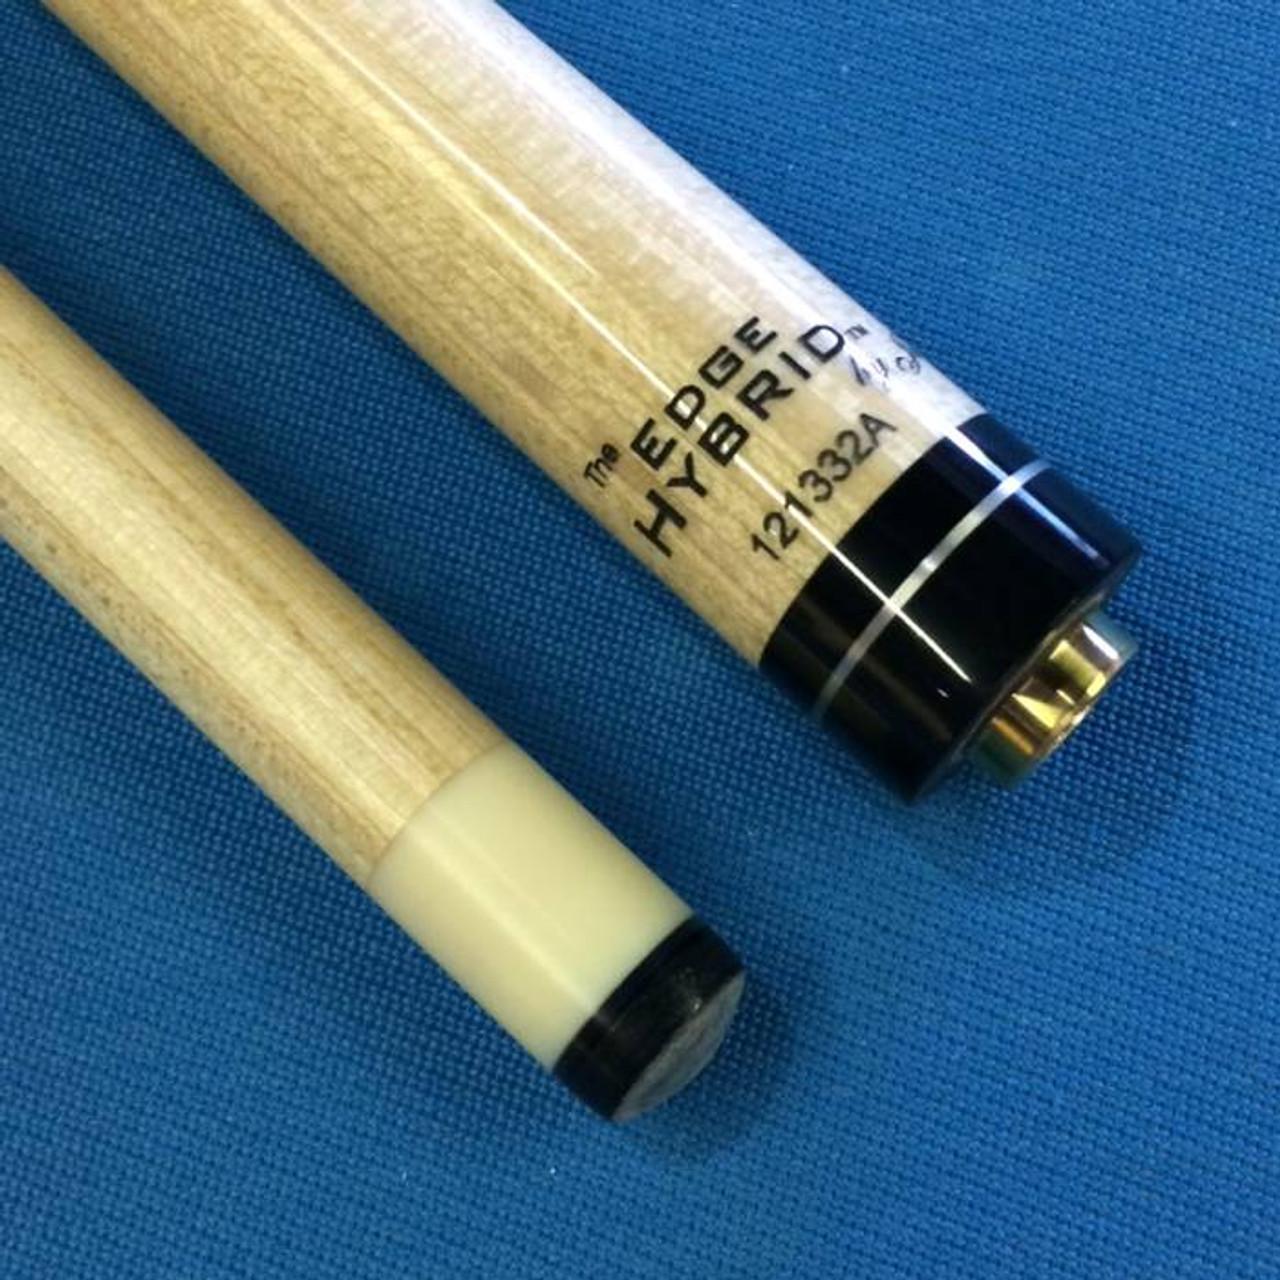 11 75mm Edge Hybrid Pechauer Pro shaft